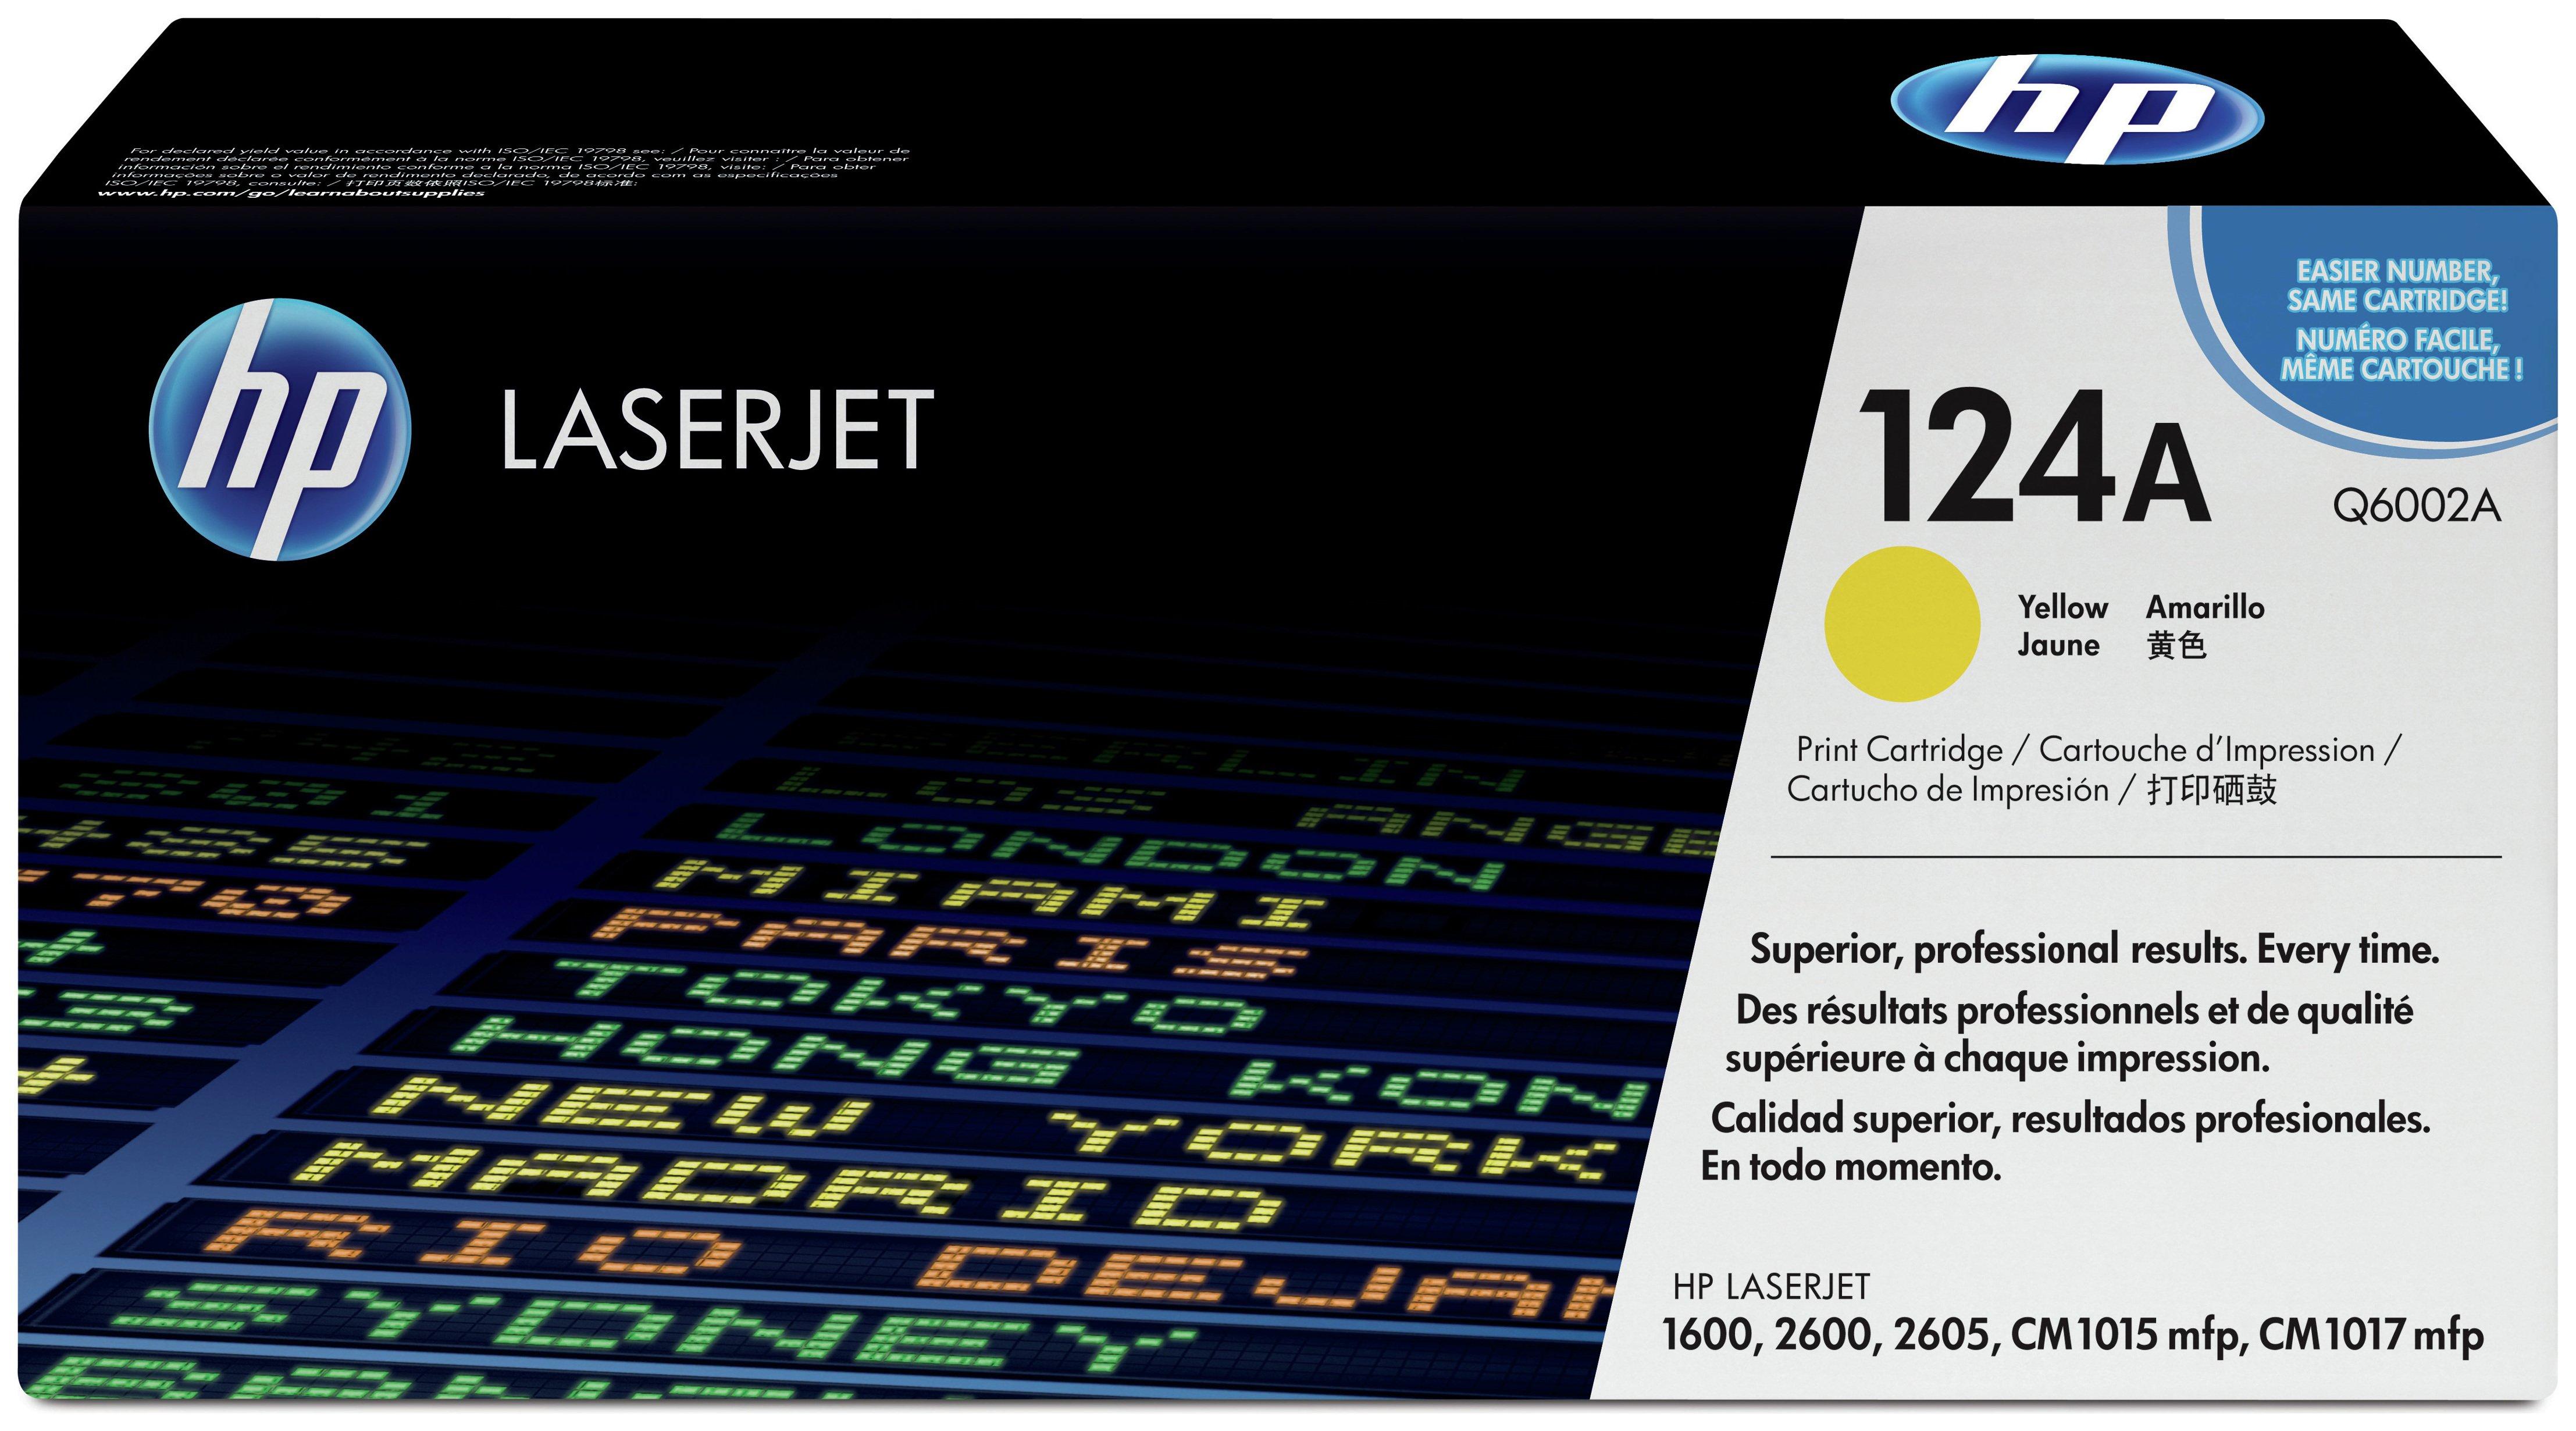 HP - 124A Yellow LaserJet - Toner Cartridge (Q6002A)